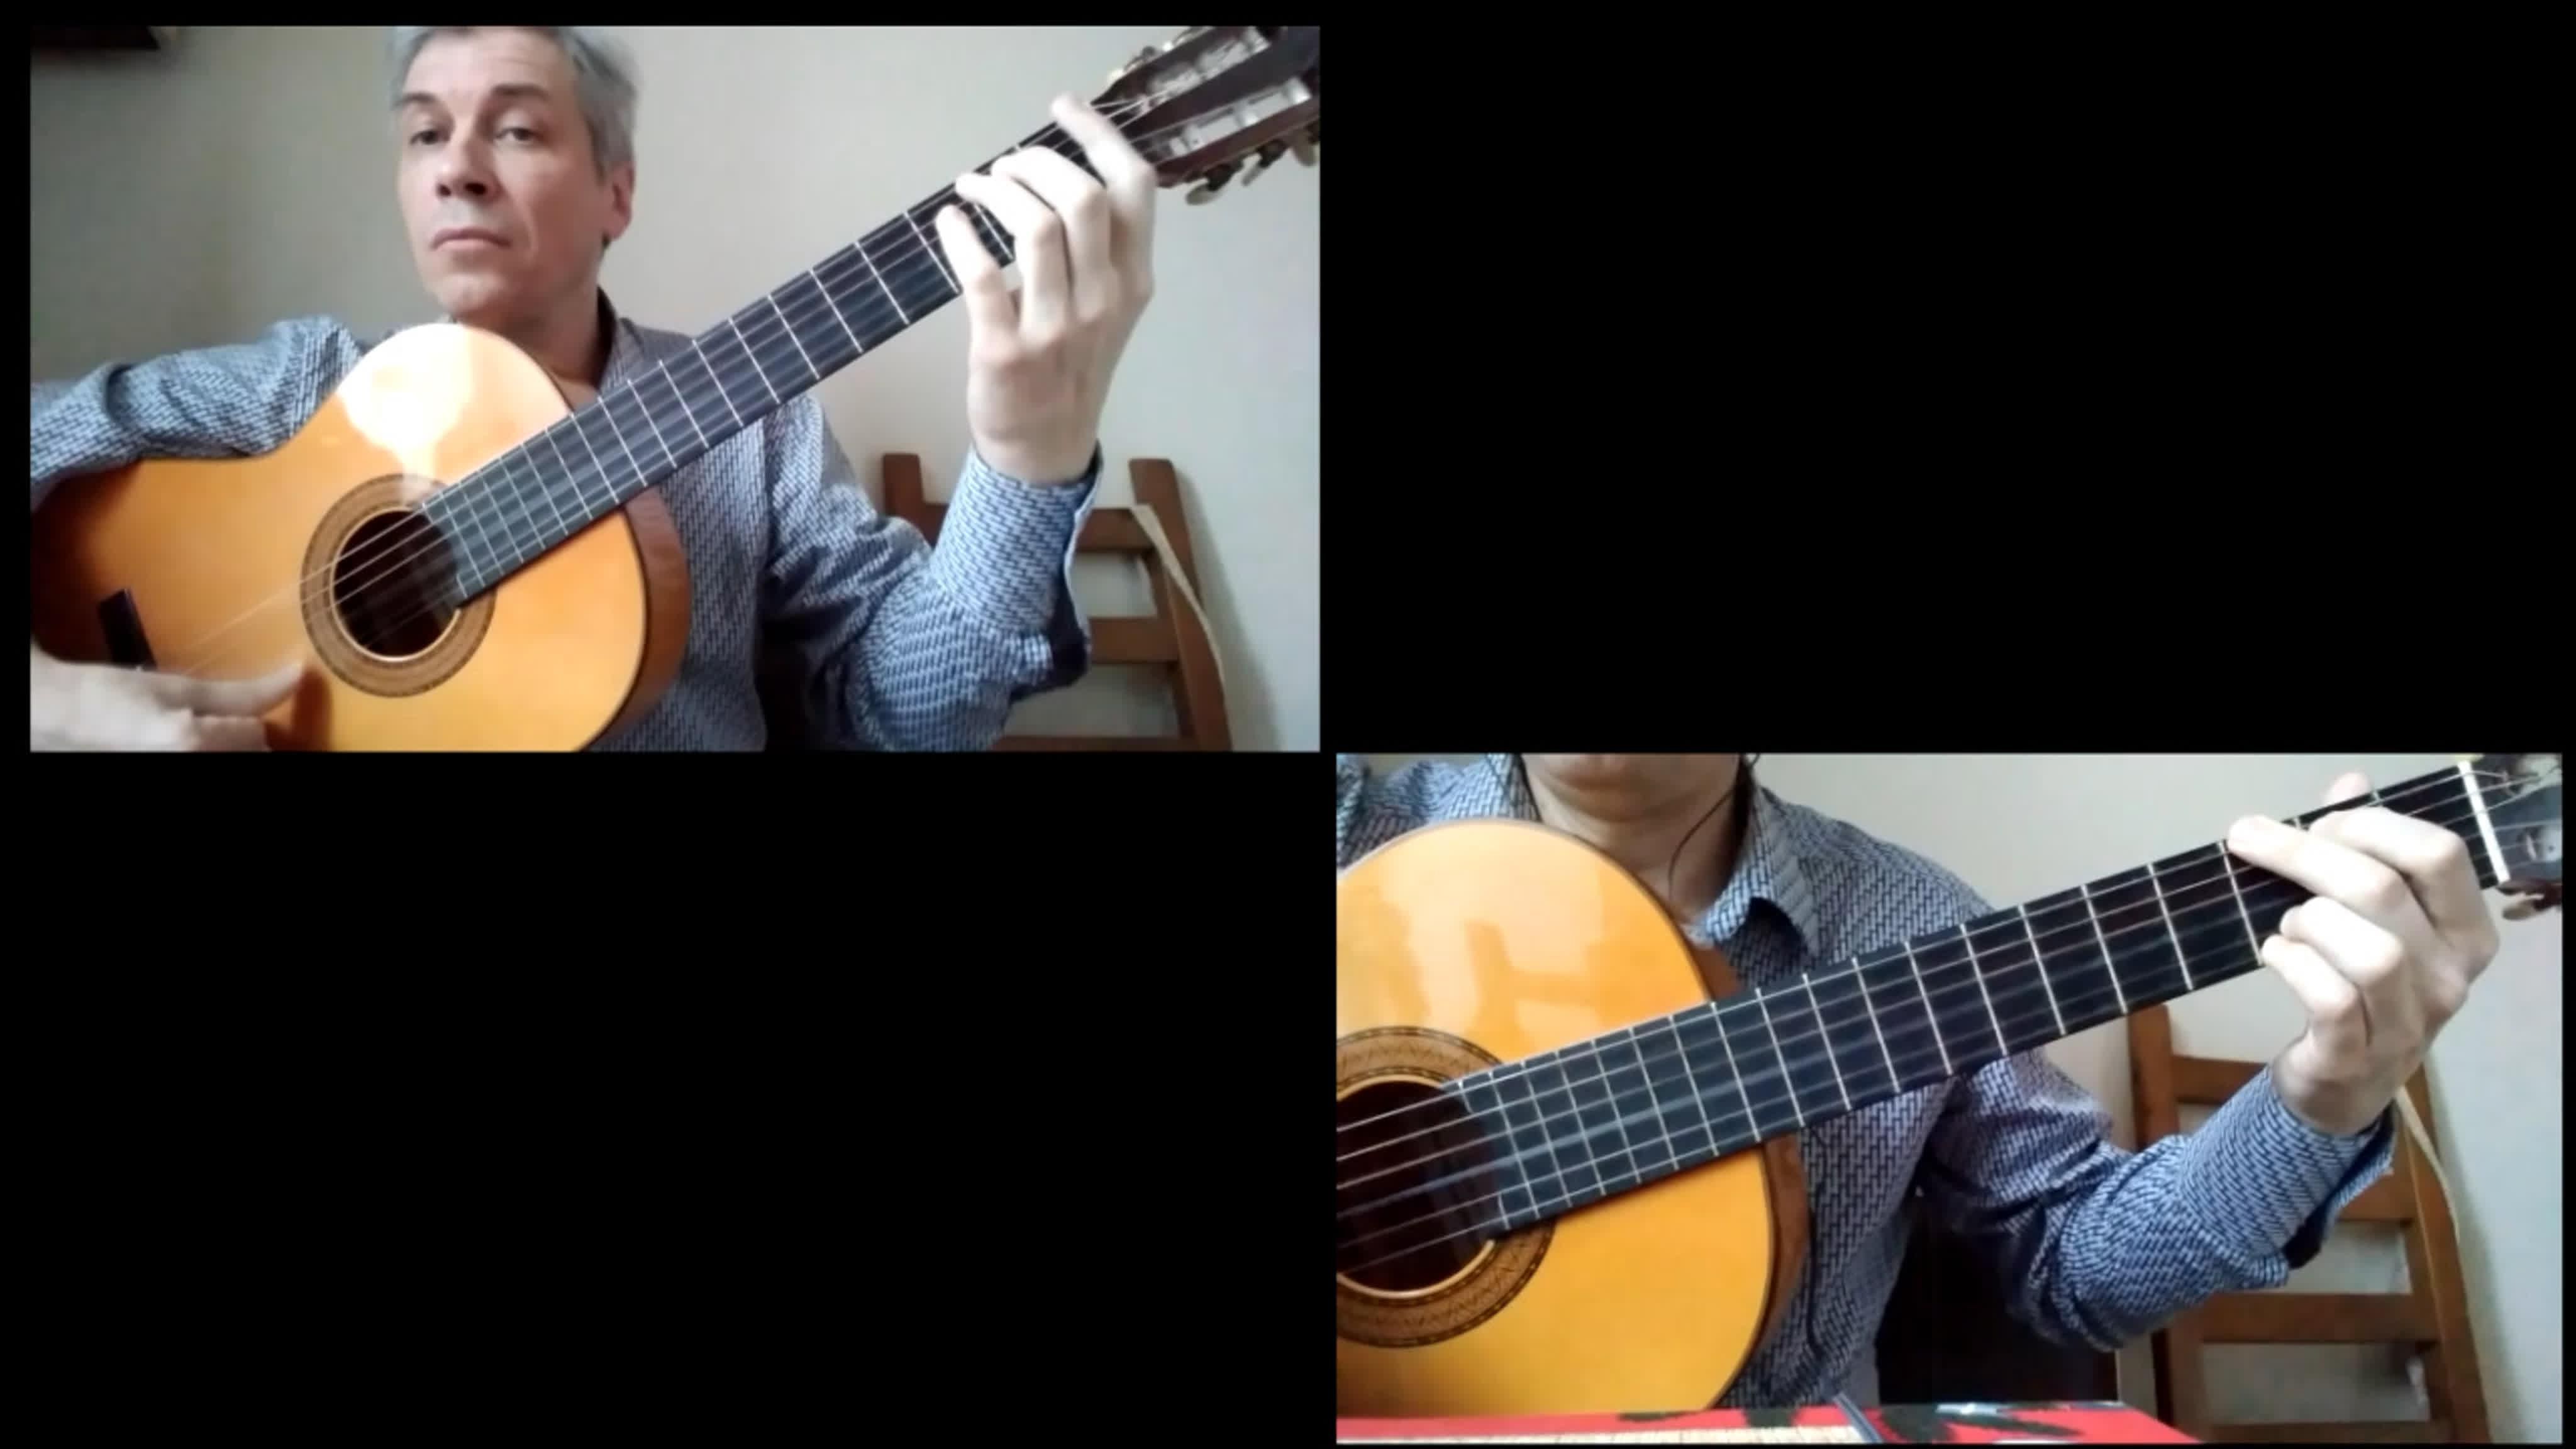 Мастер-класс по игре на гитаре